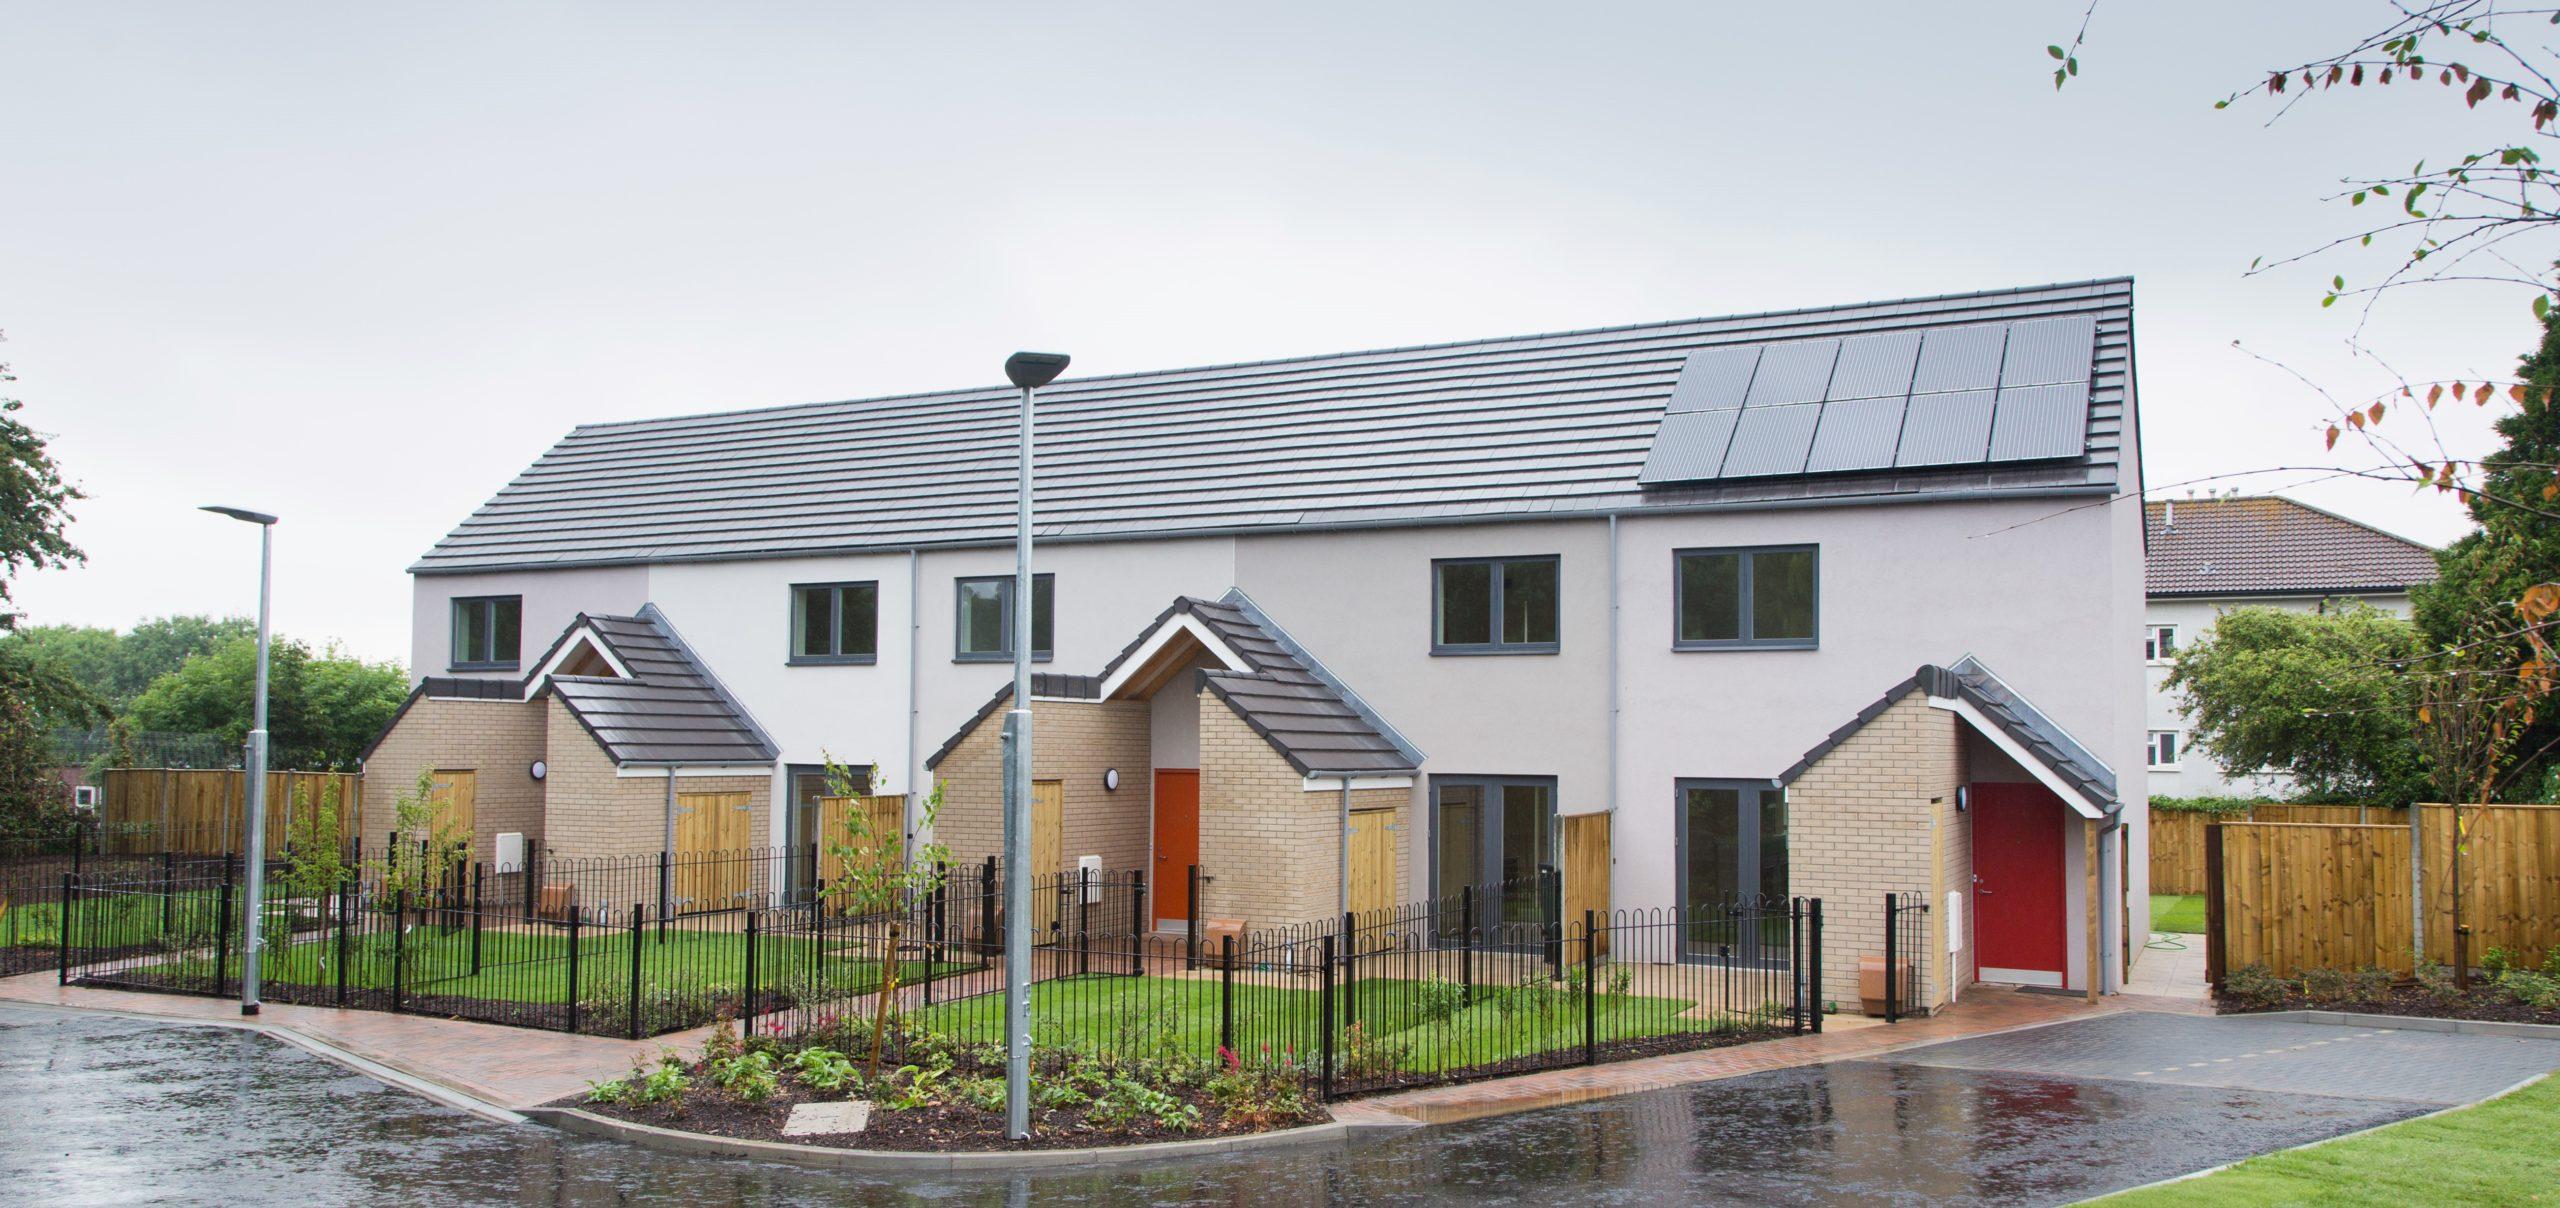 Bristol City Council Affordable Housing